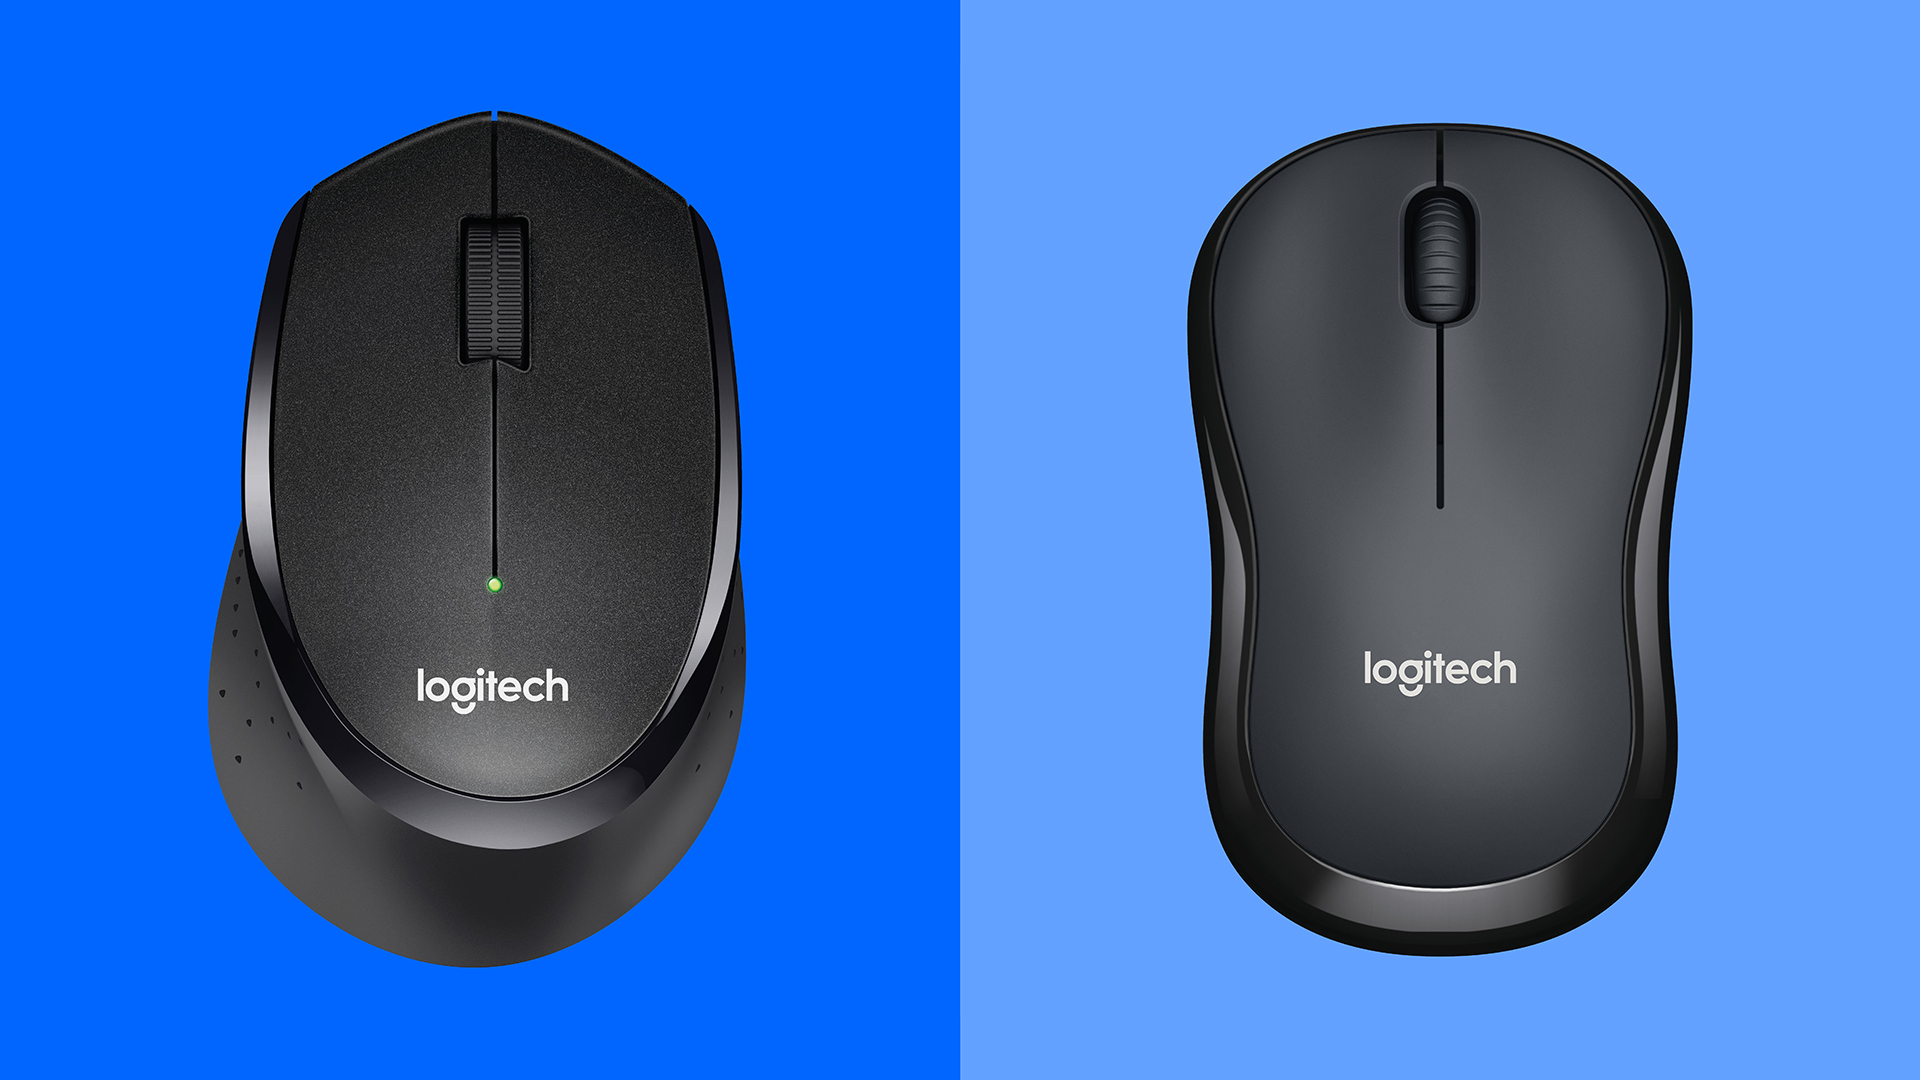 Squeak no more: Logitech announces a silent mouse | TechRadar